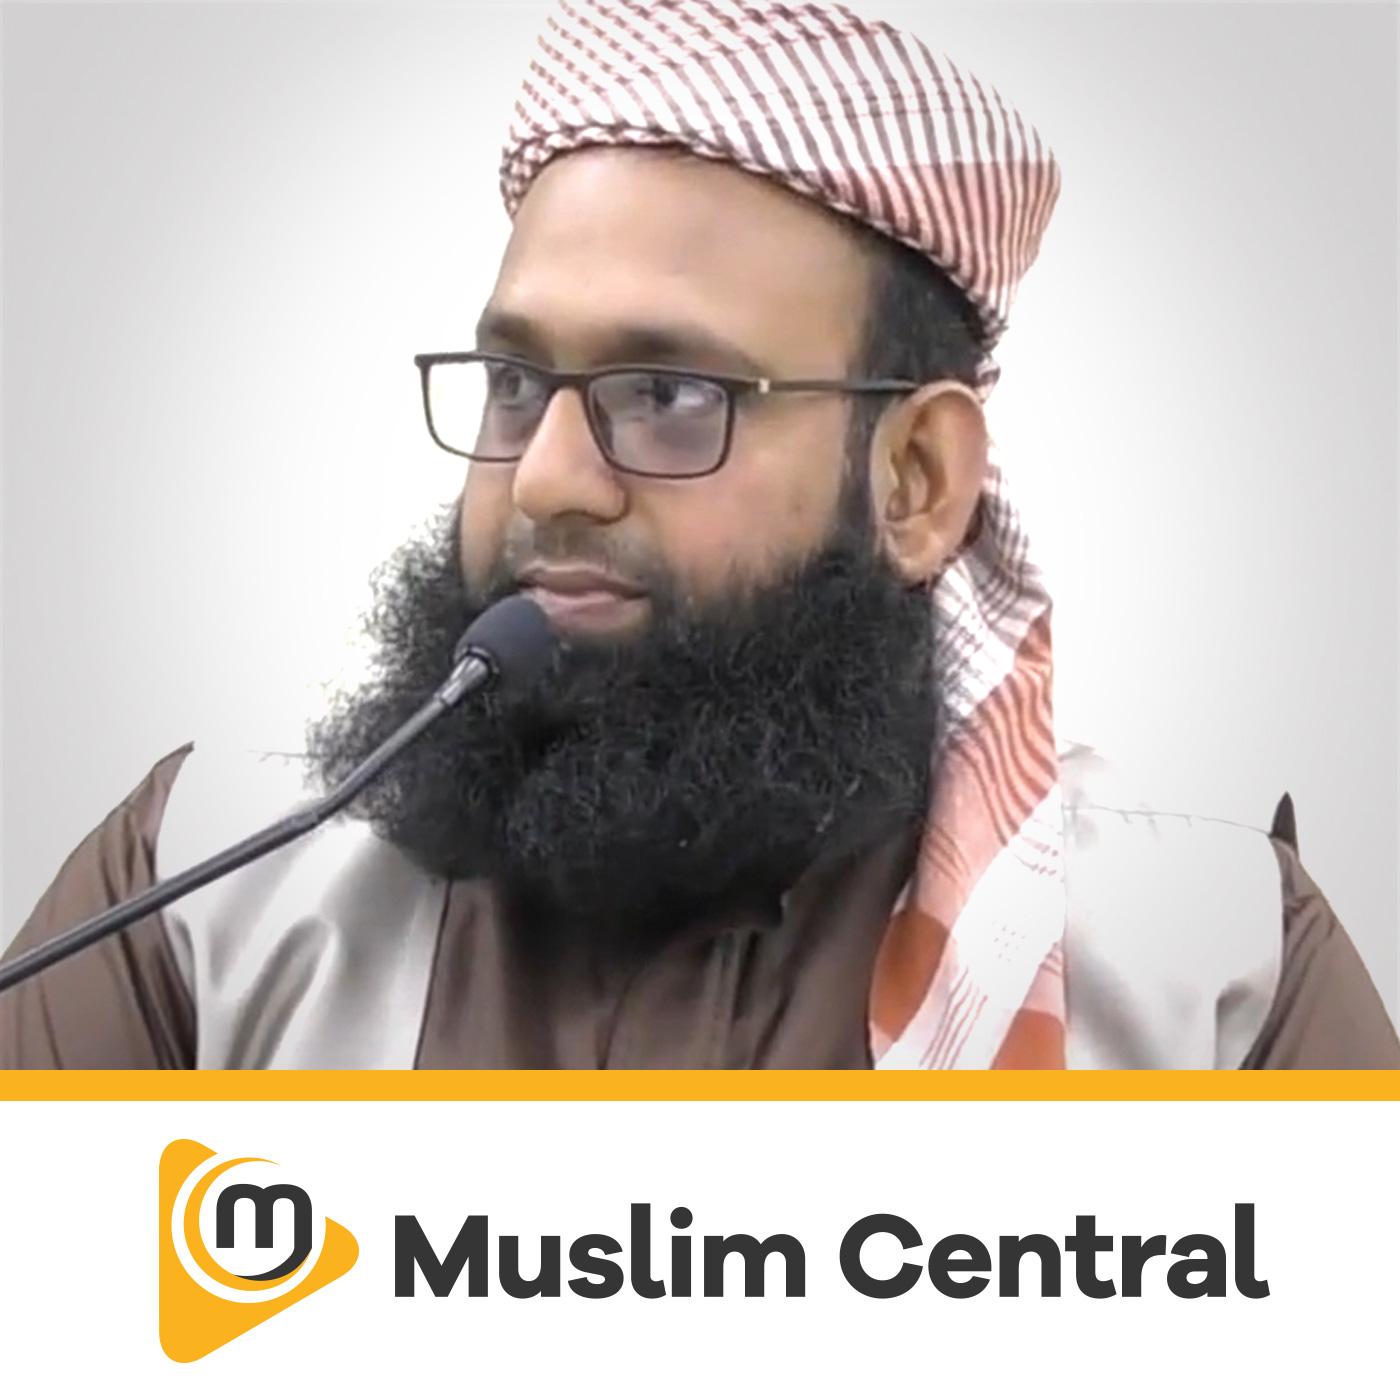 Common Errors in Salaah - Hastening through Postures